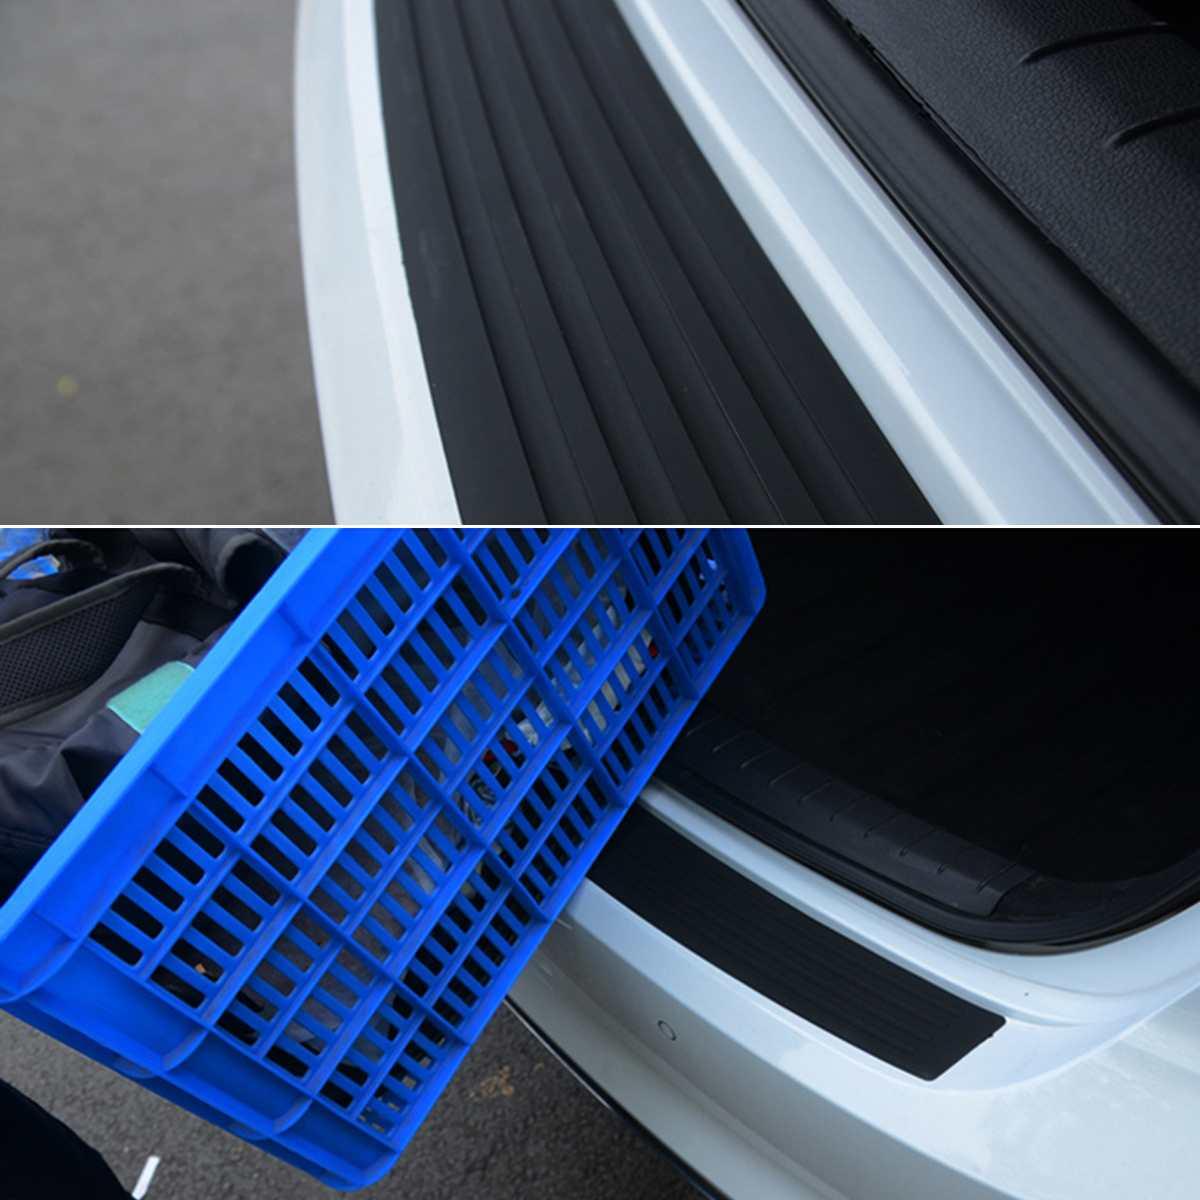 90CM, Placa de protección de maletero trasera para coche, pegatina, moldura de parachoques, protección contra rasguños para Chevrolet Cruze, para Hyundai Renault